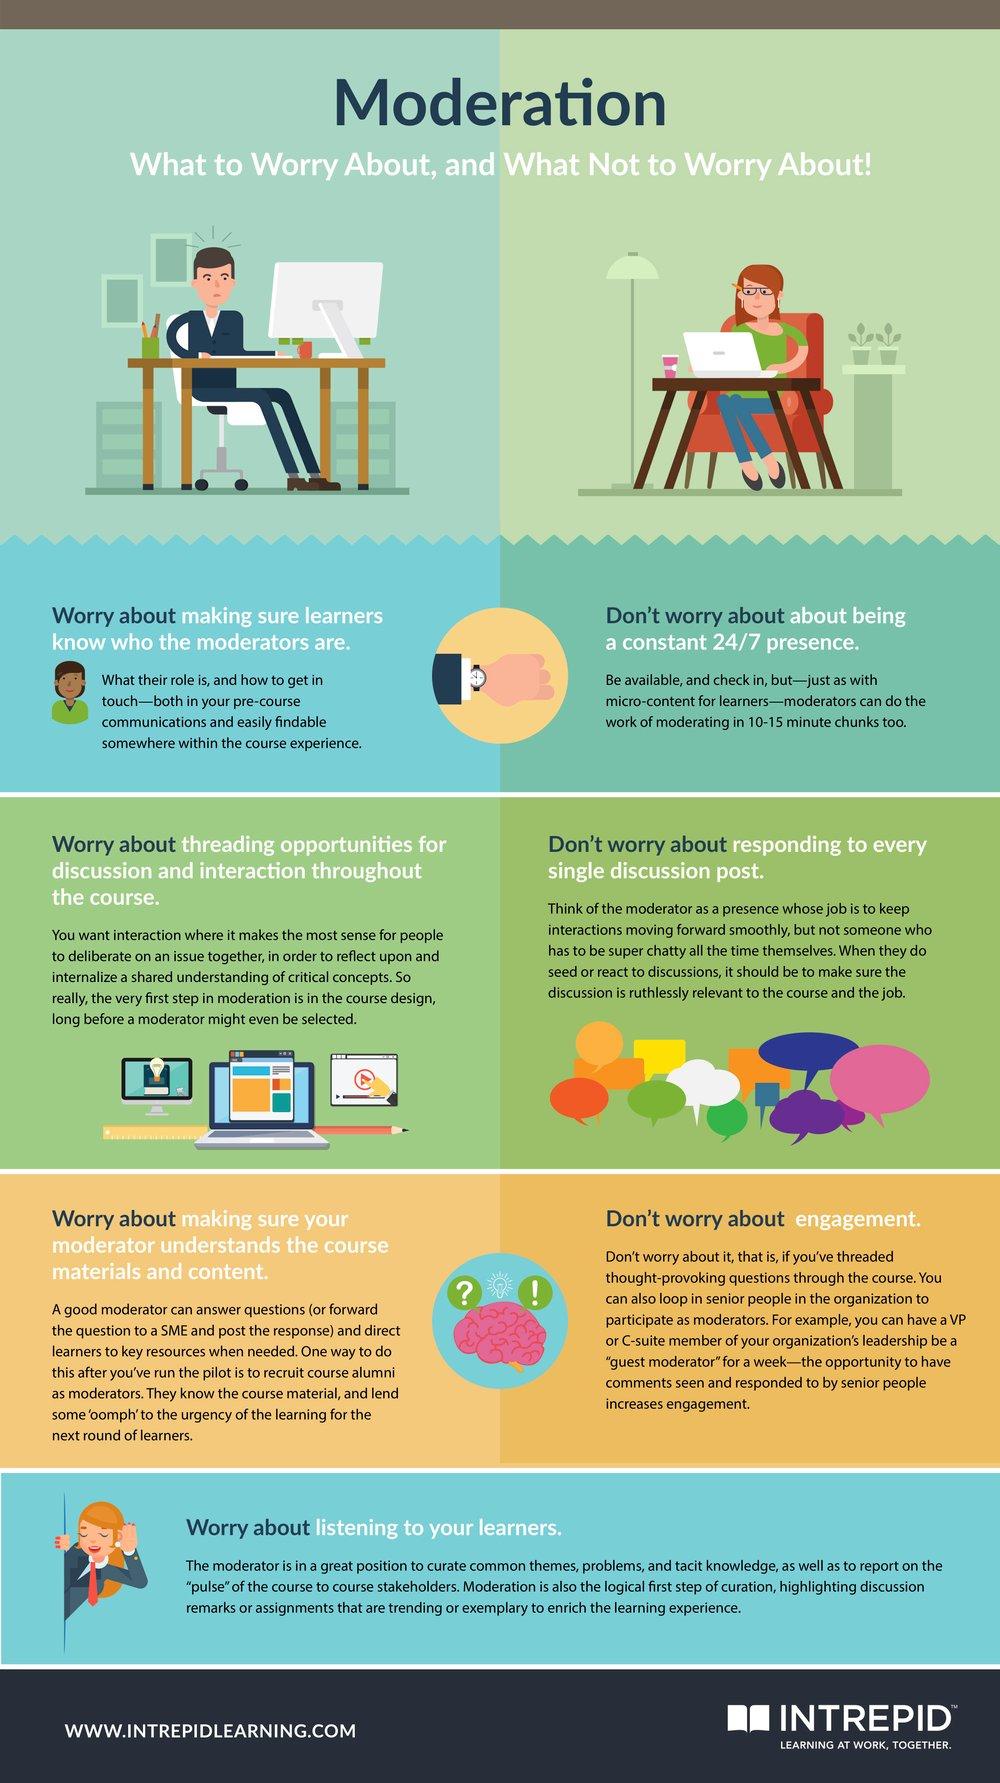 Intrepid_Moderation_Infographic